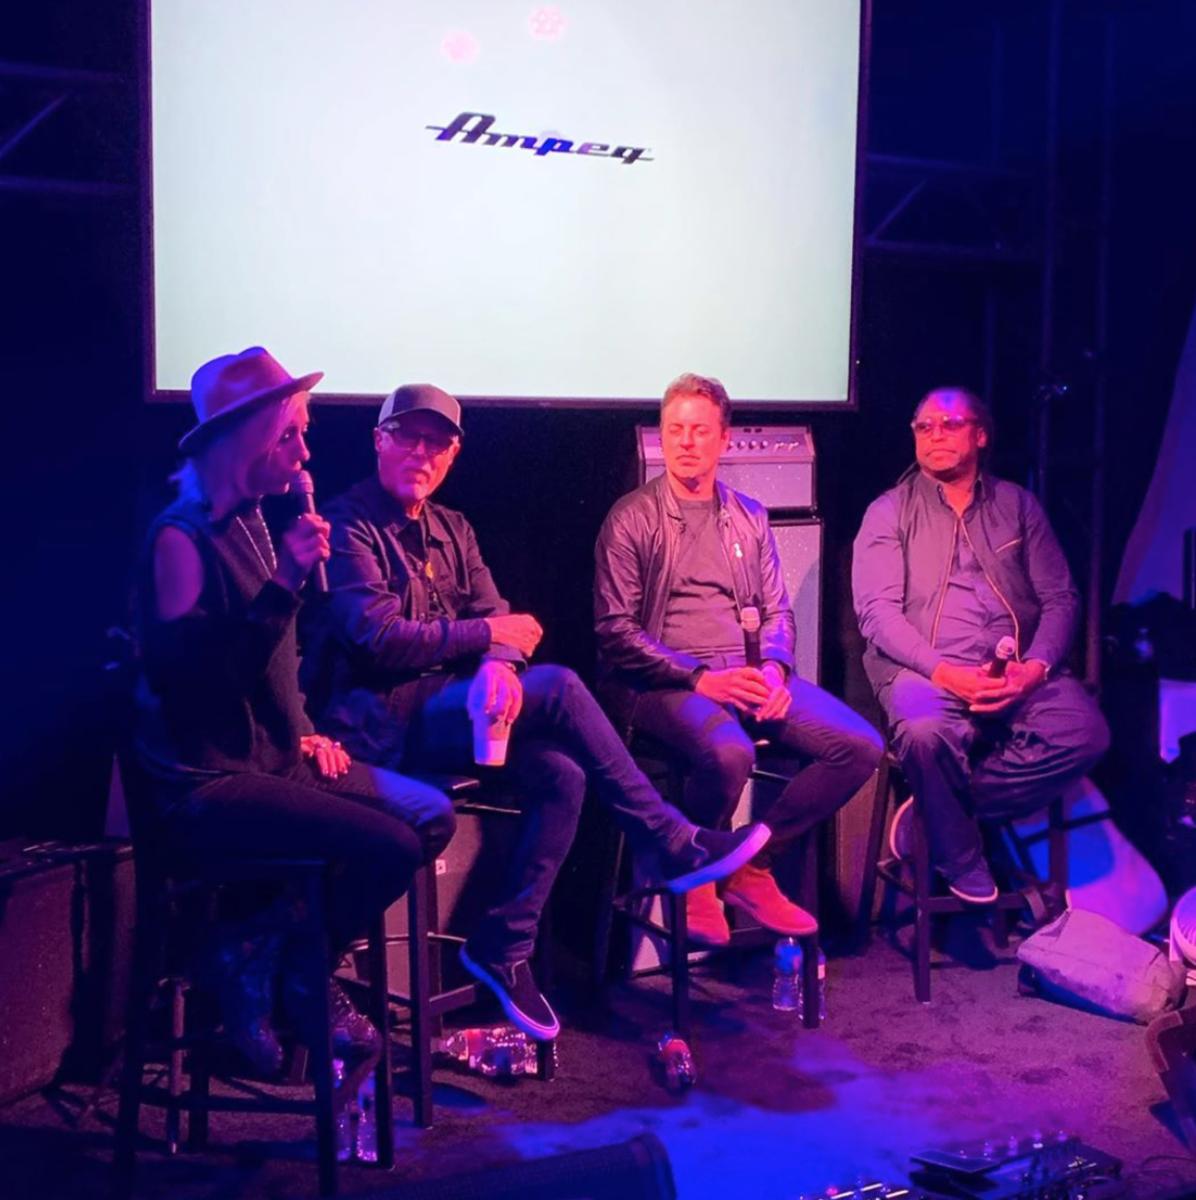 Eva Gardner, Bob Glaub, Sean Hurley, and Darryl Jones doing the Ampeg roundtable.